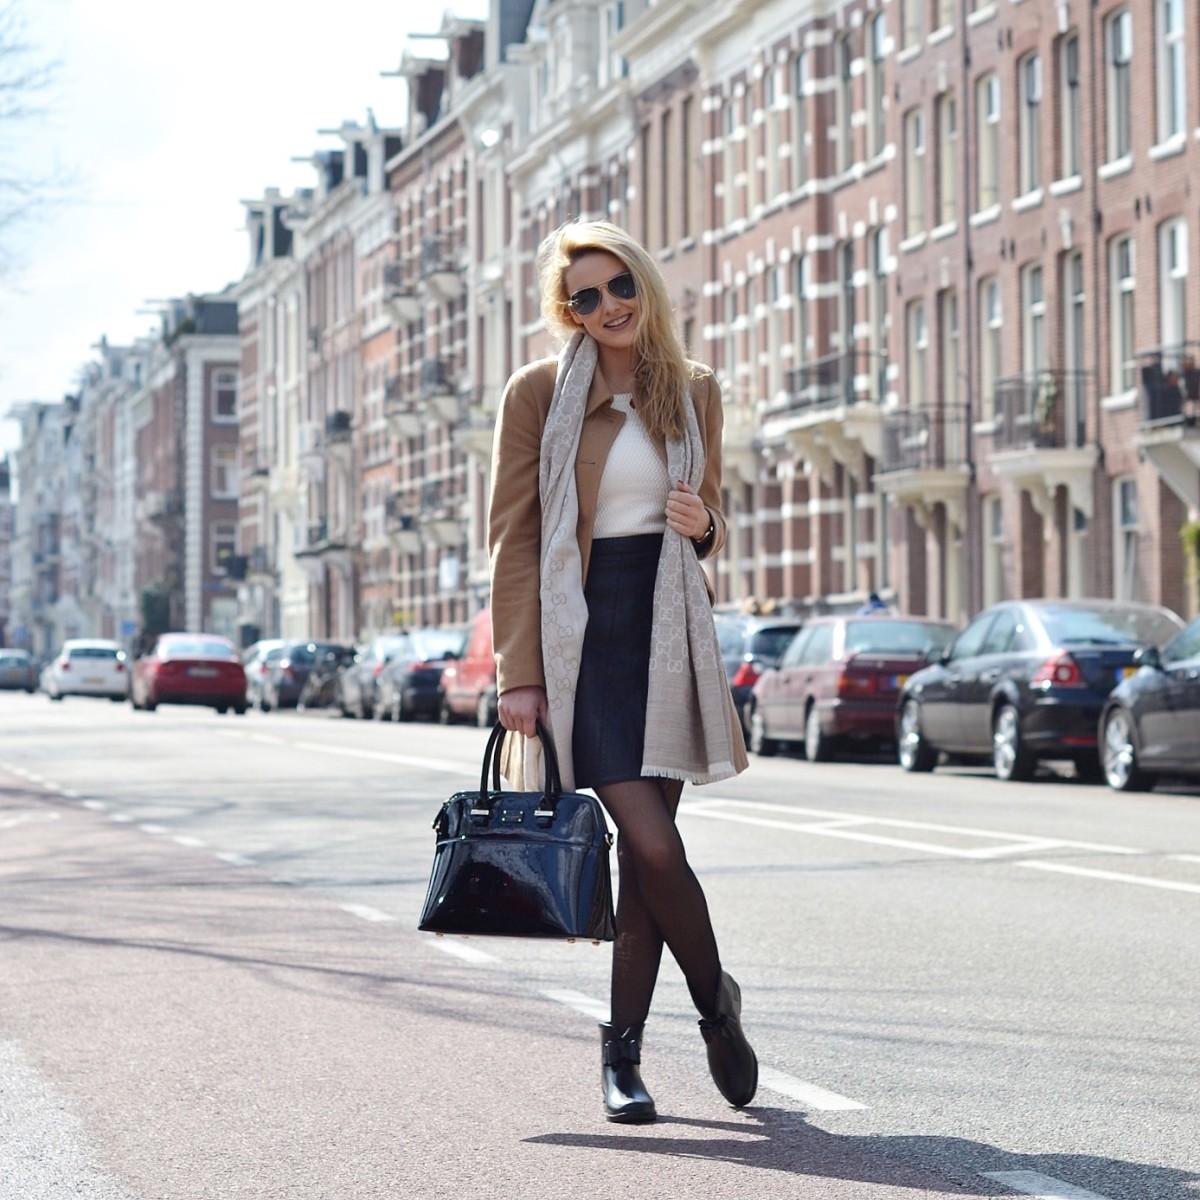 Amsterdammmm